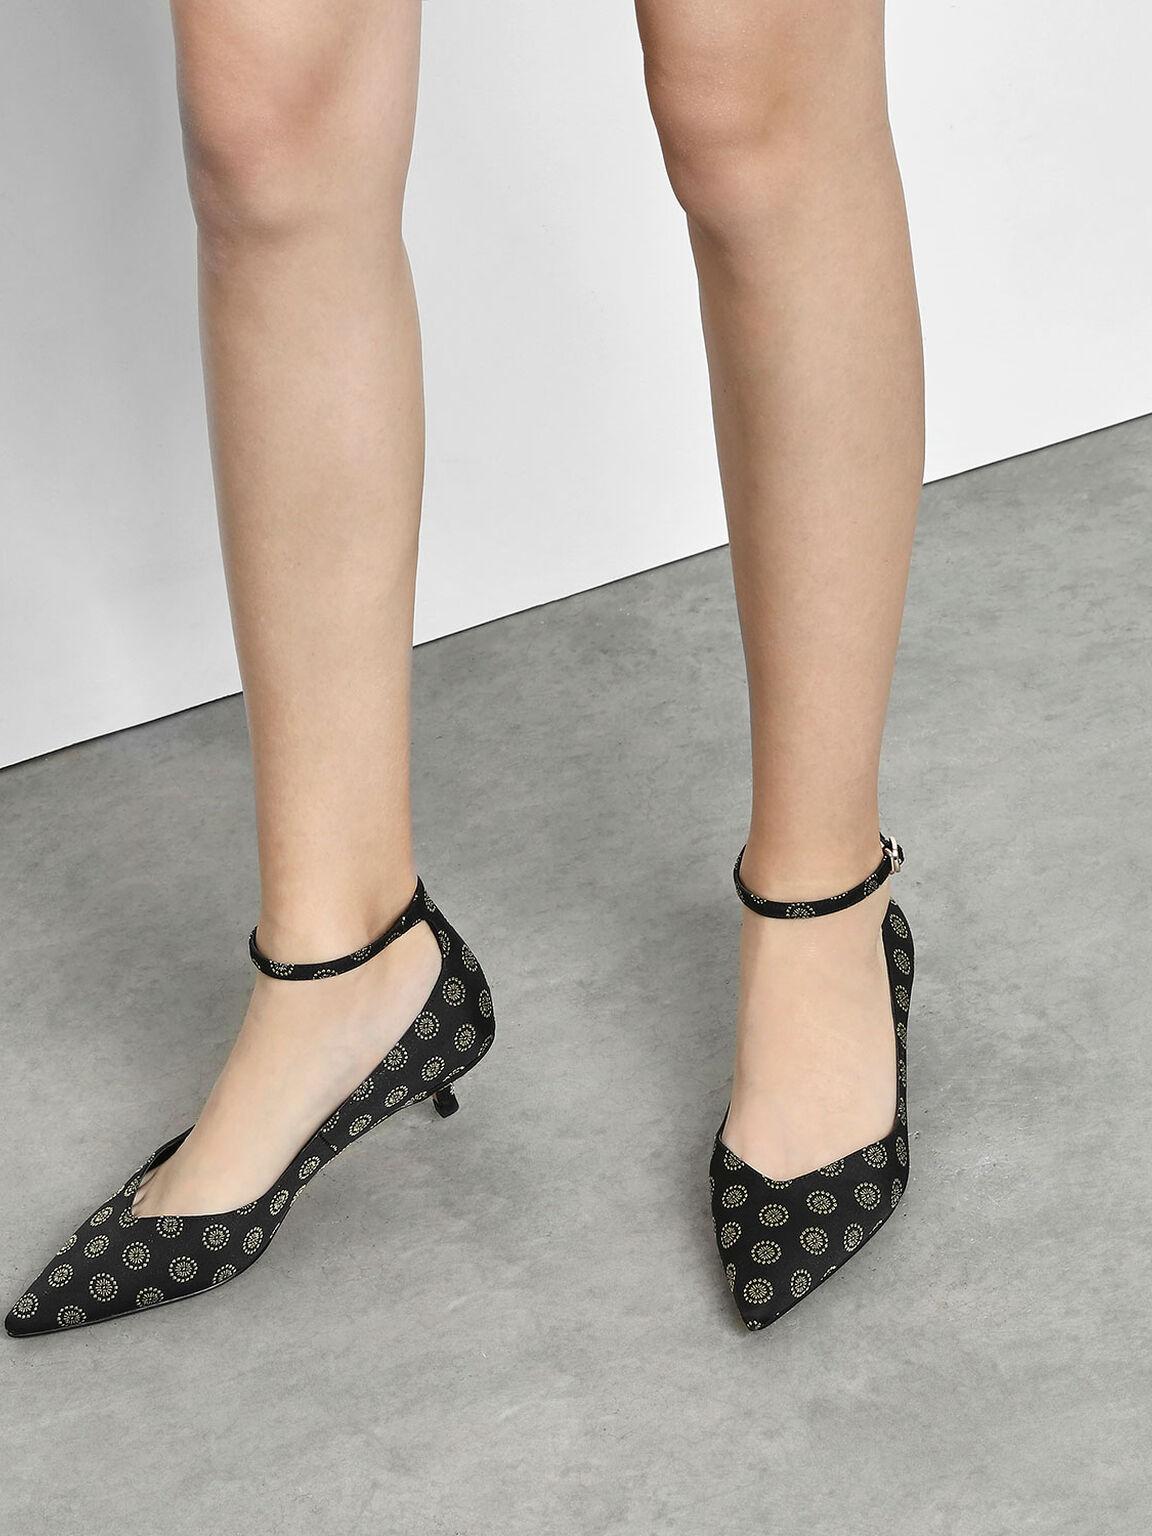 V Cut Kitten Heel Pumps, Black Textured, hi-res